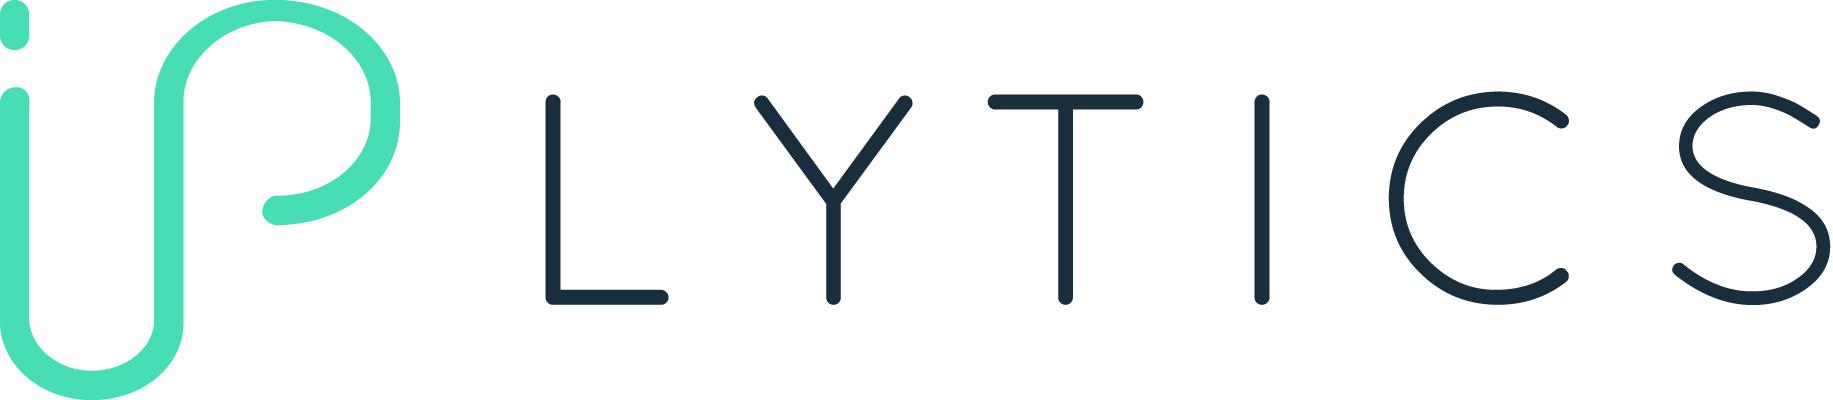 IPLYTICS_logo_rgb_on_white